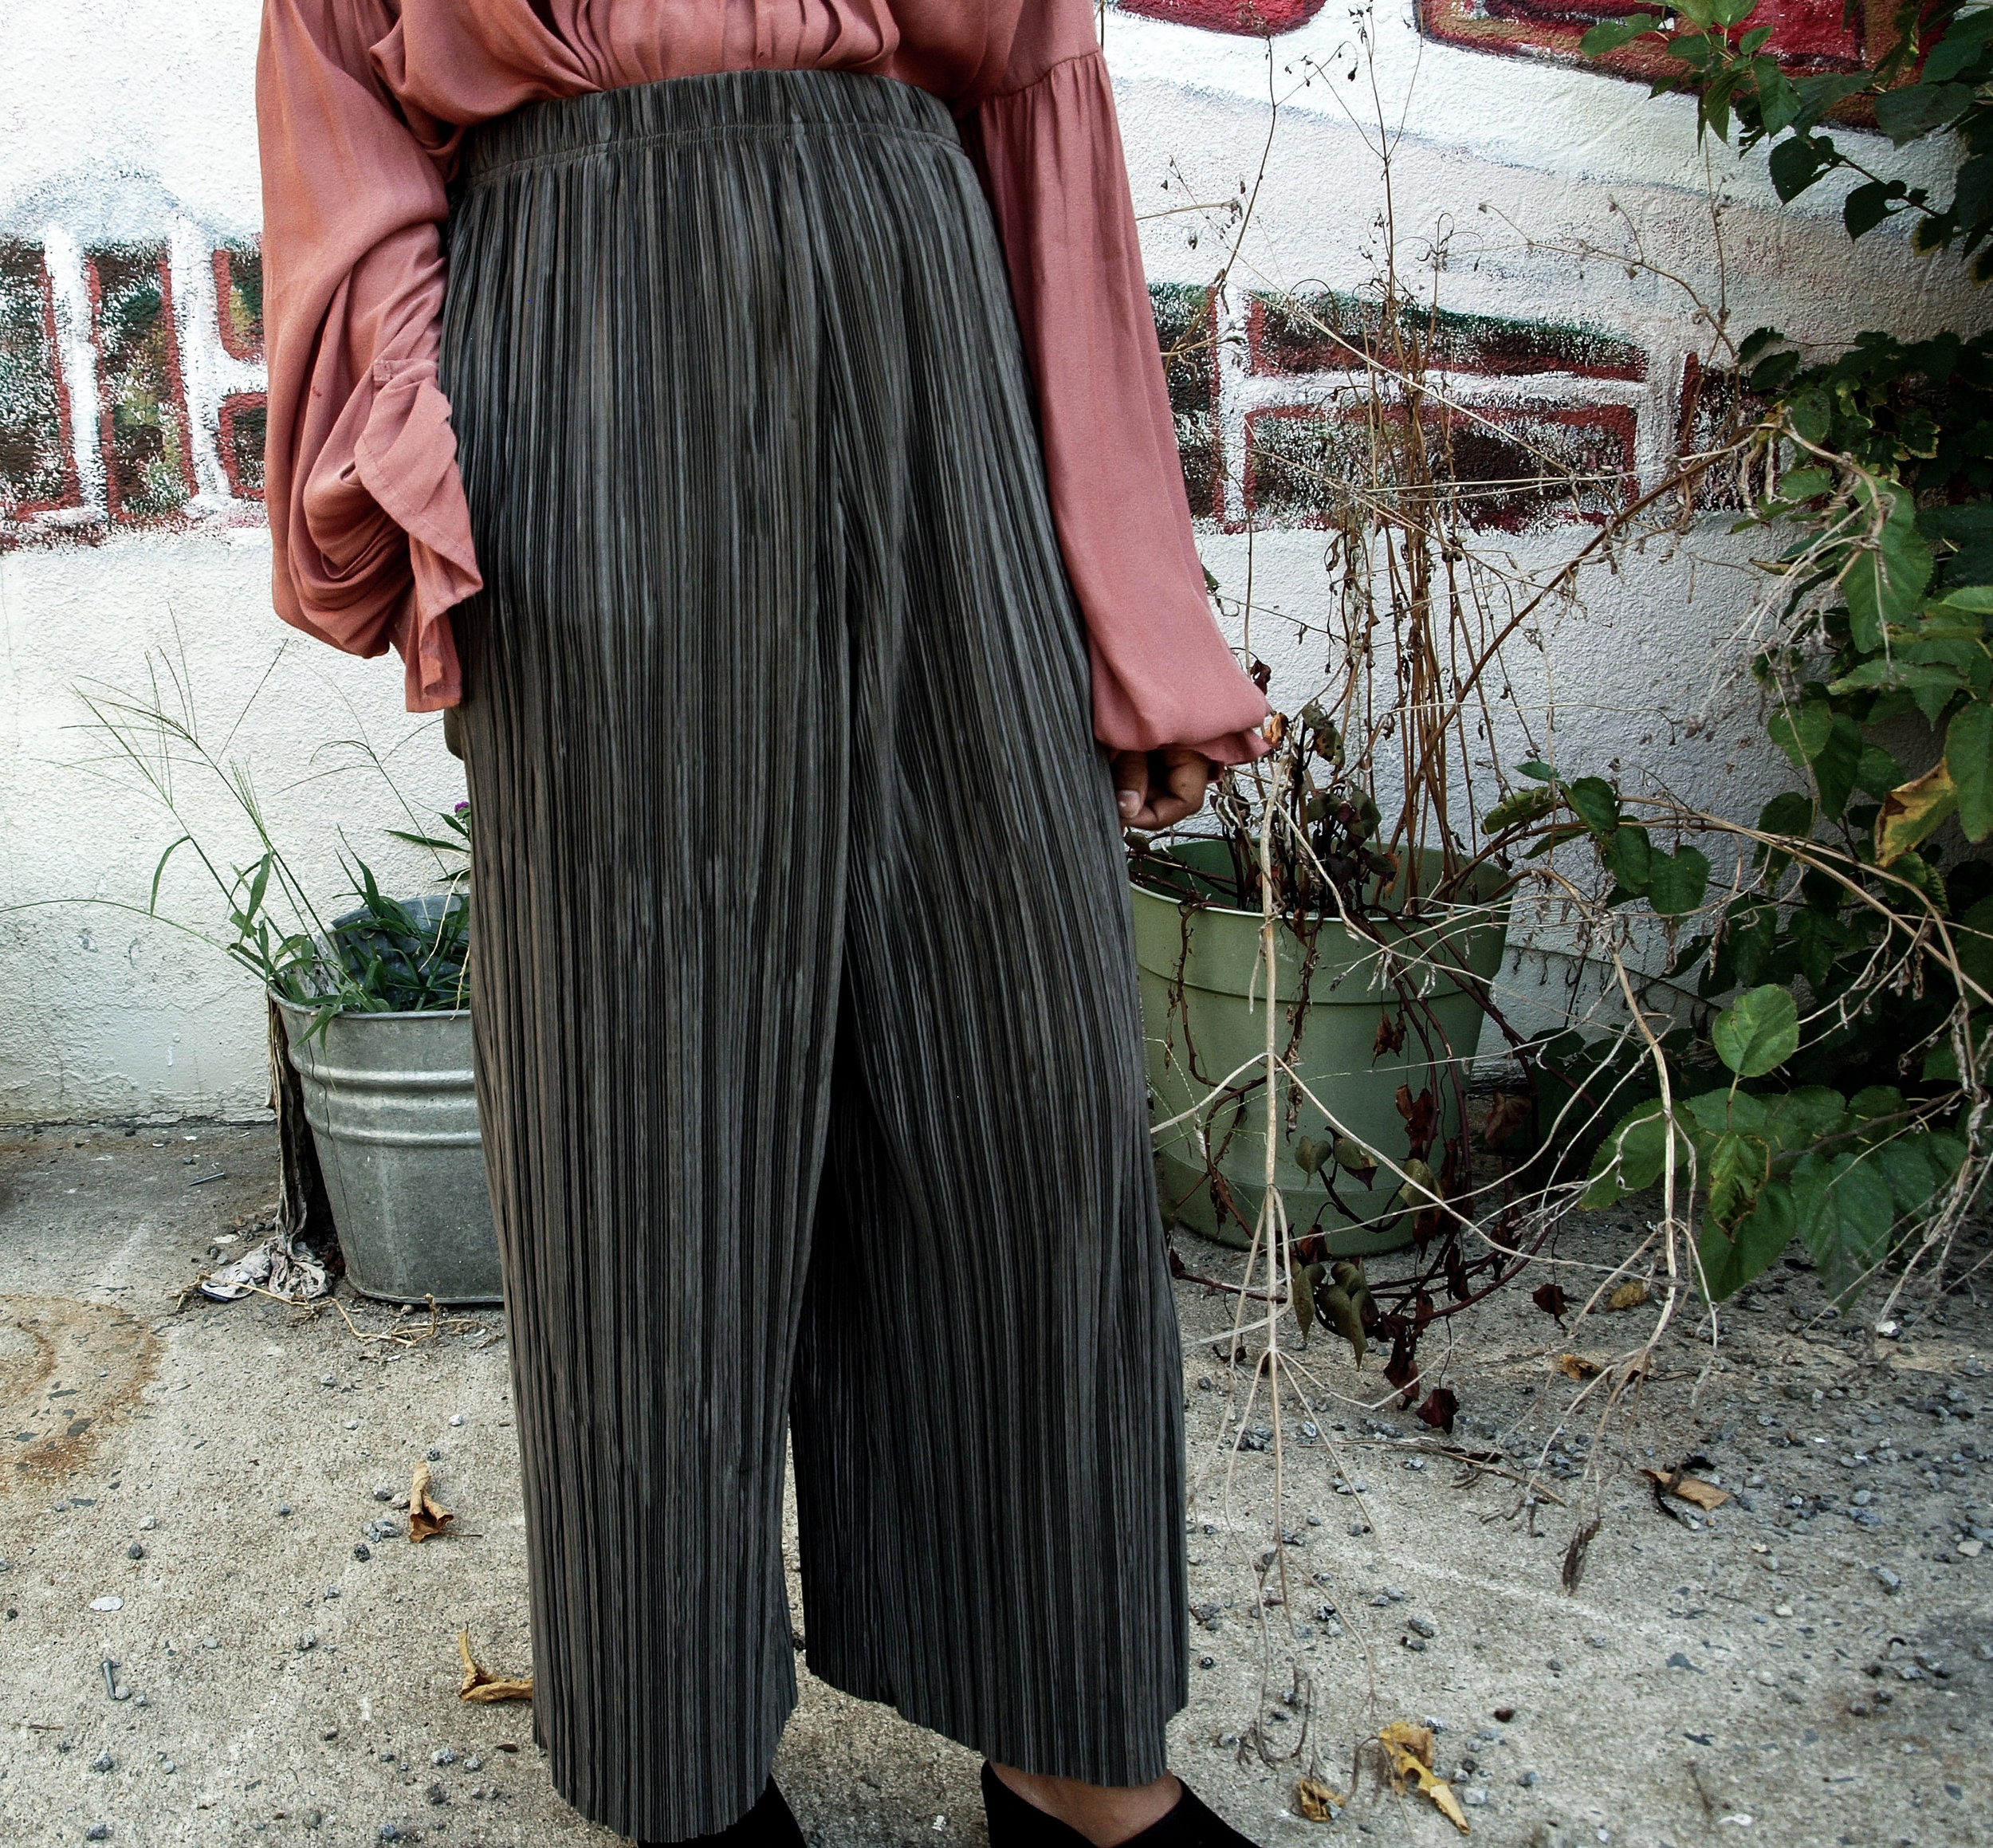 Topshop Khaki Plisse Pants